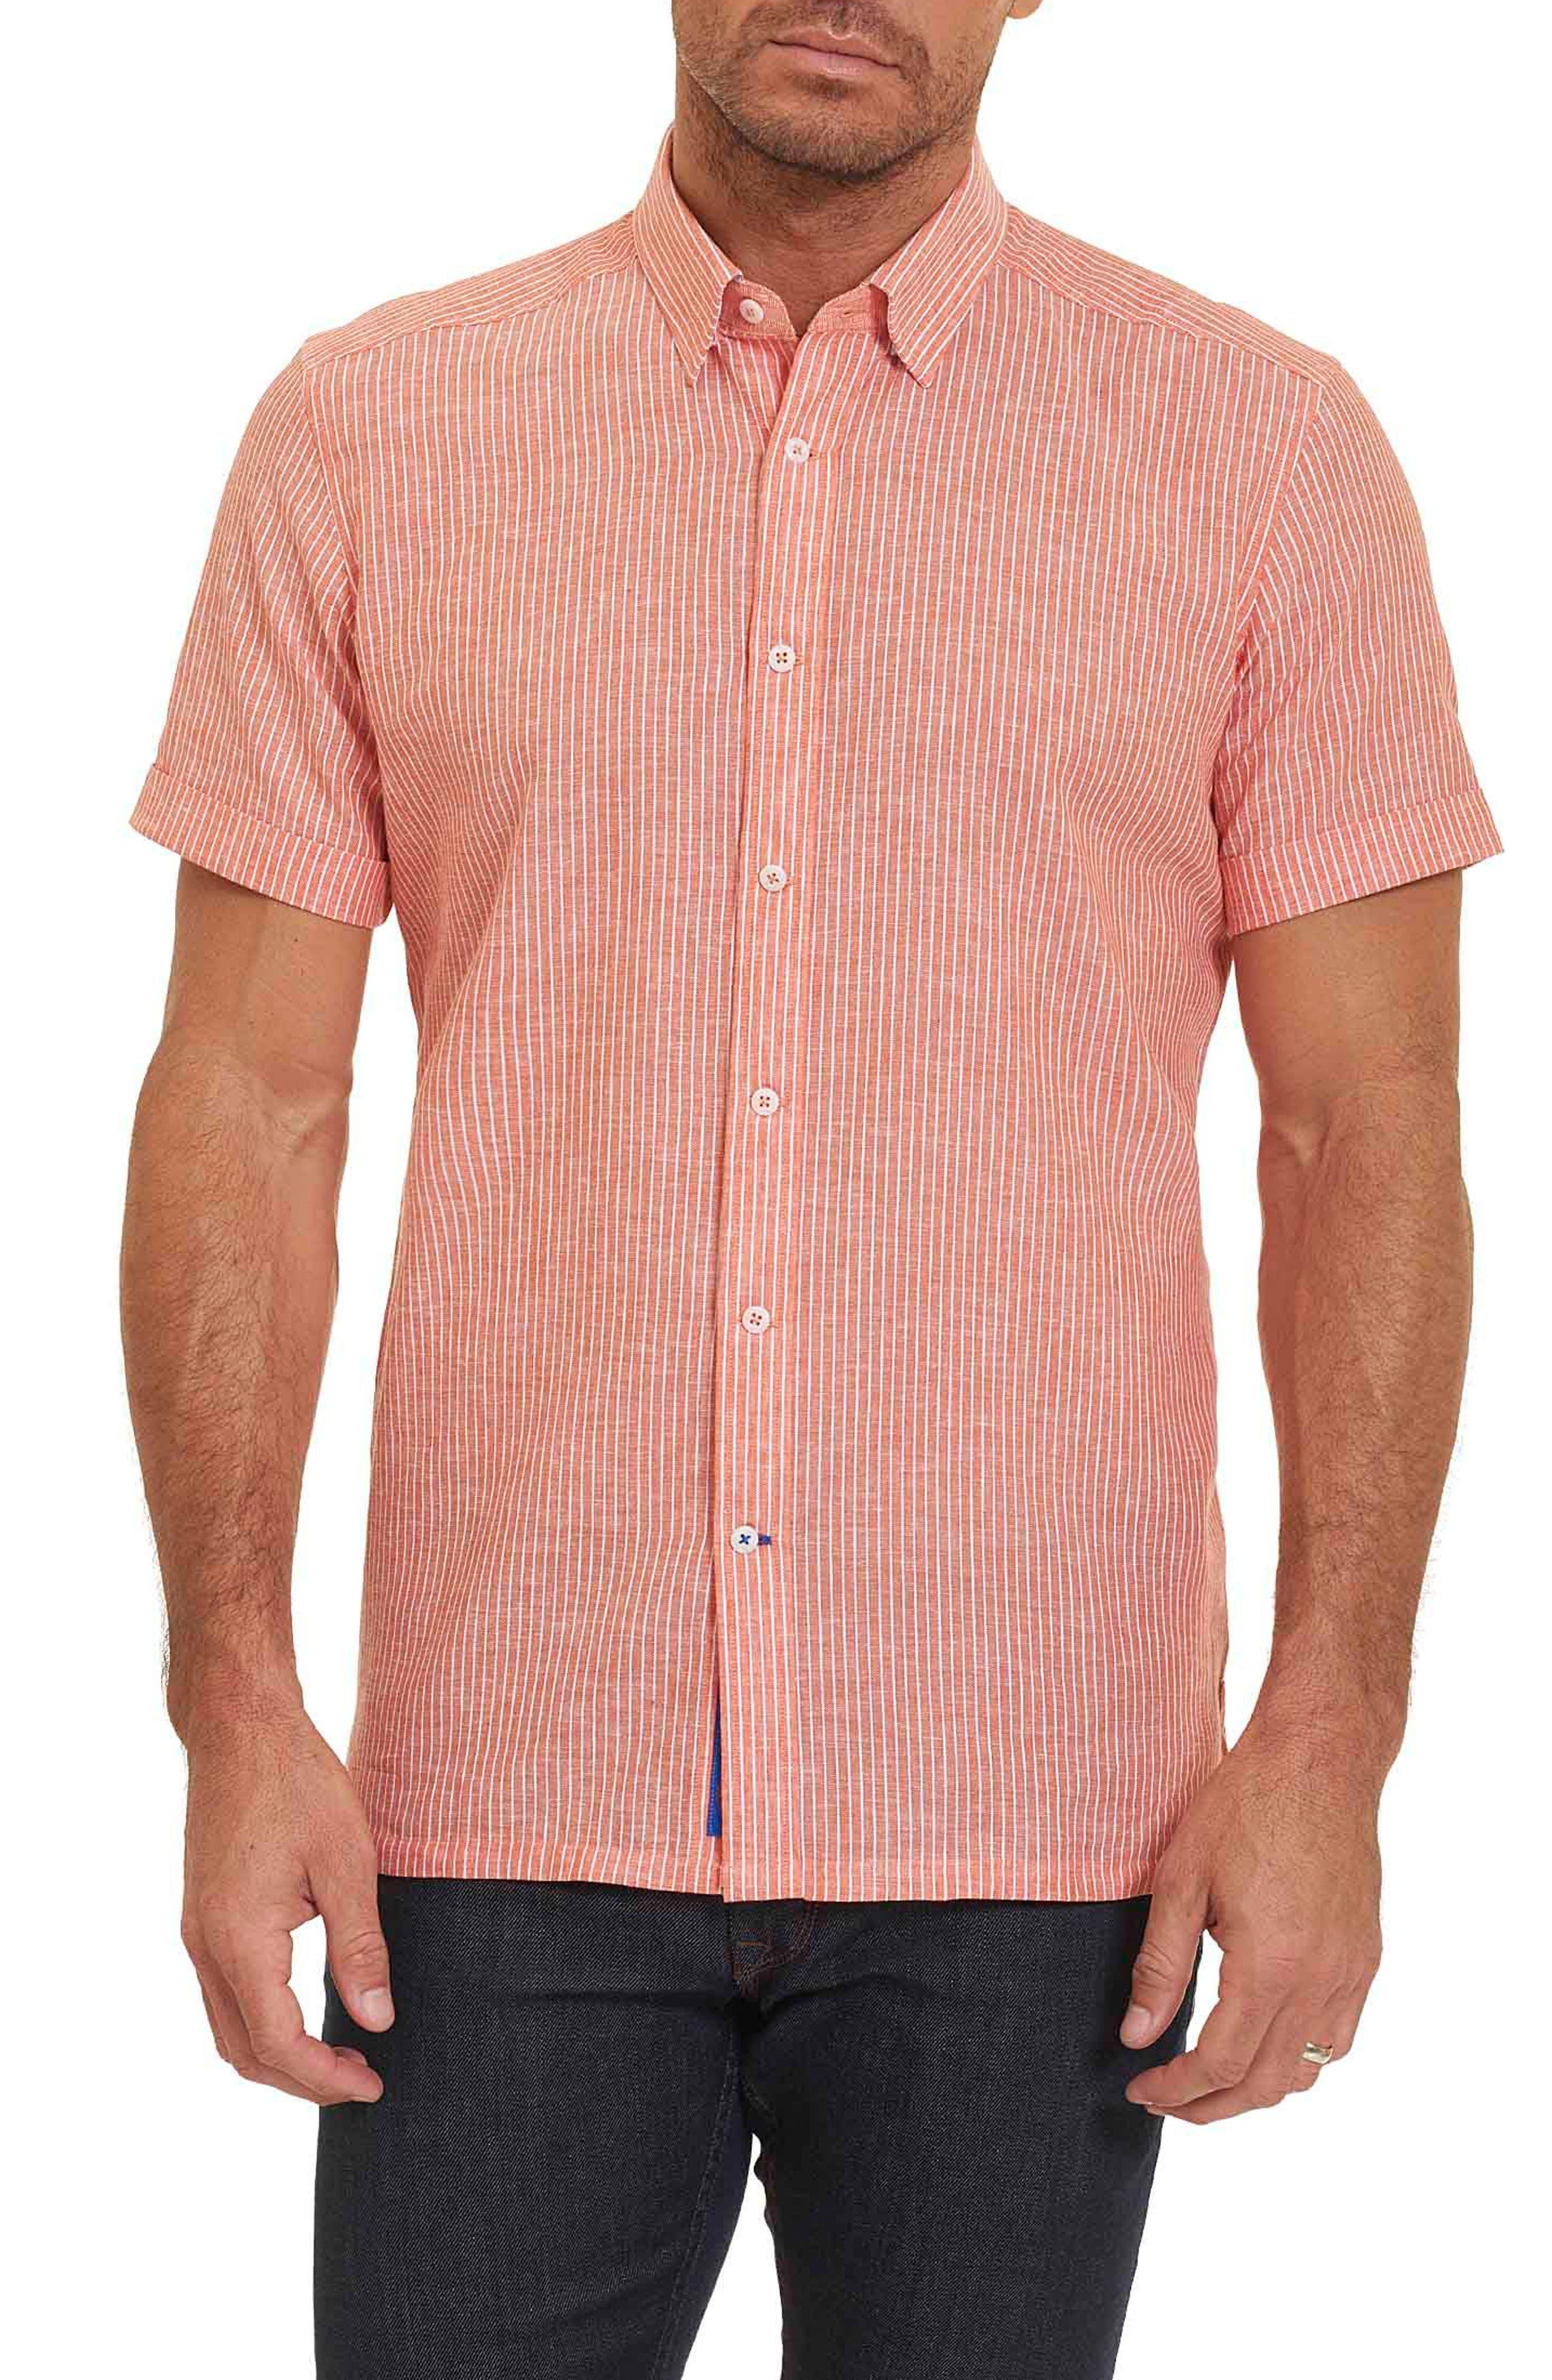 Alternate Image 1 Selected - Robert Graham Tailored Fit Stripe Short Sleeve Sport Shirt